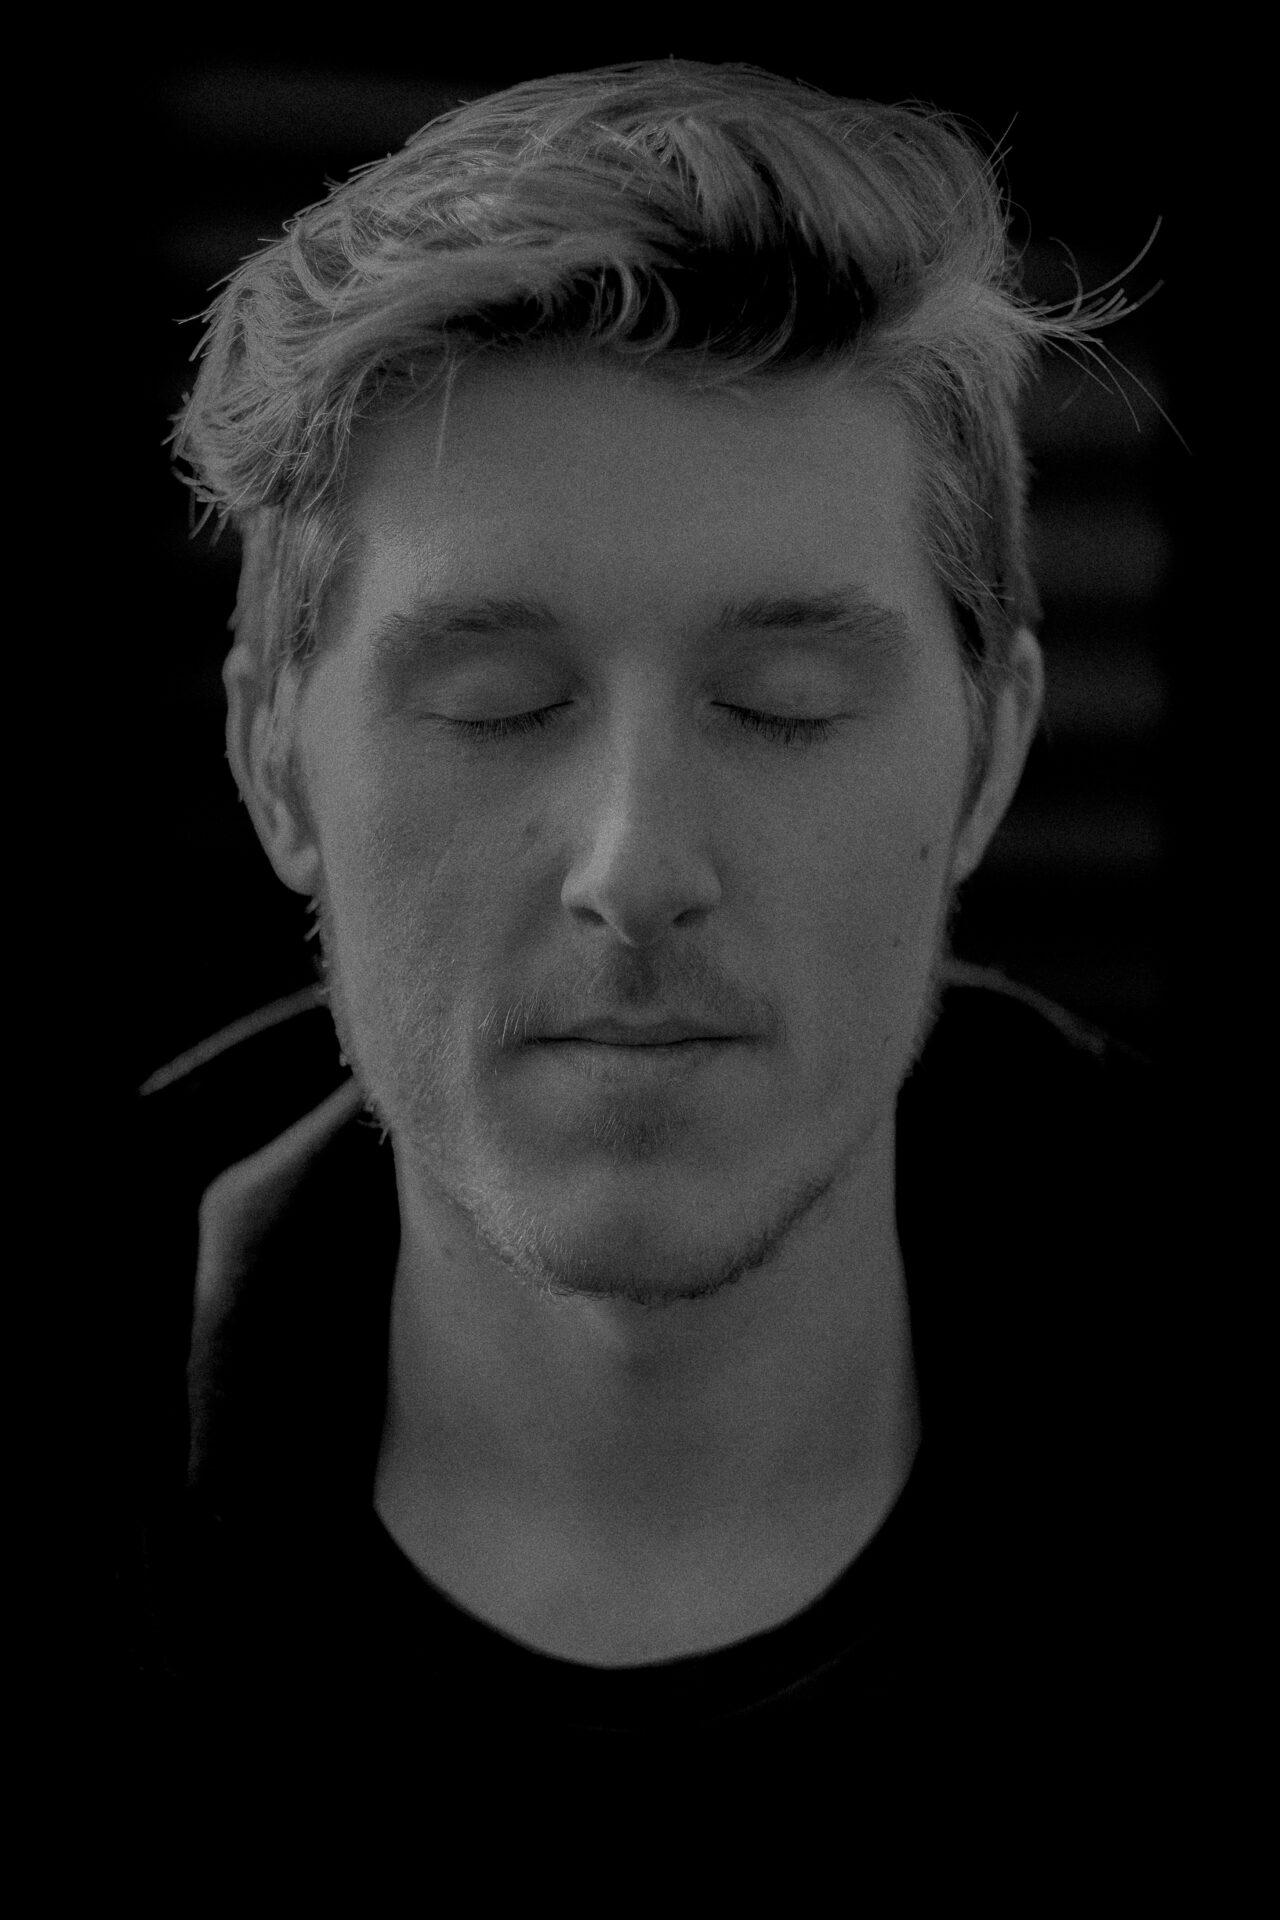 male portrait closed eyes